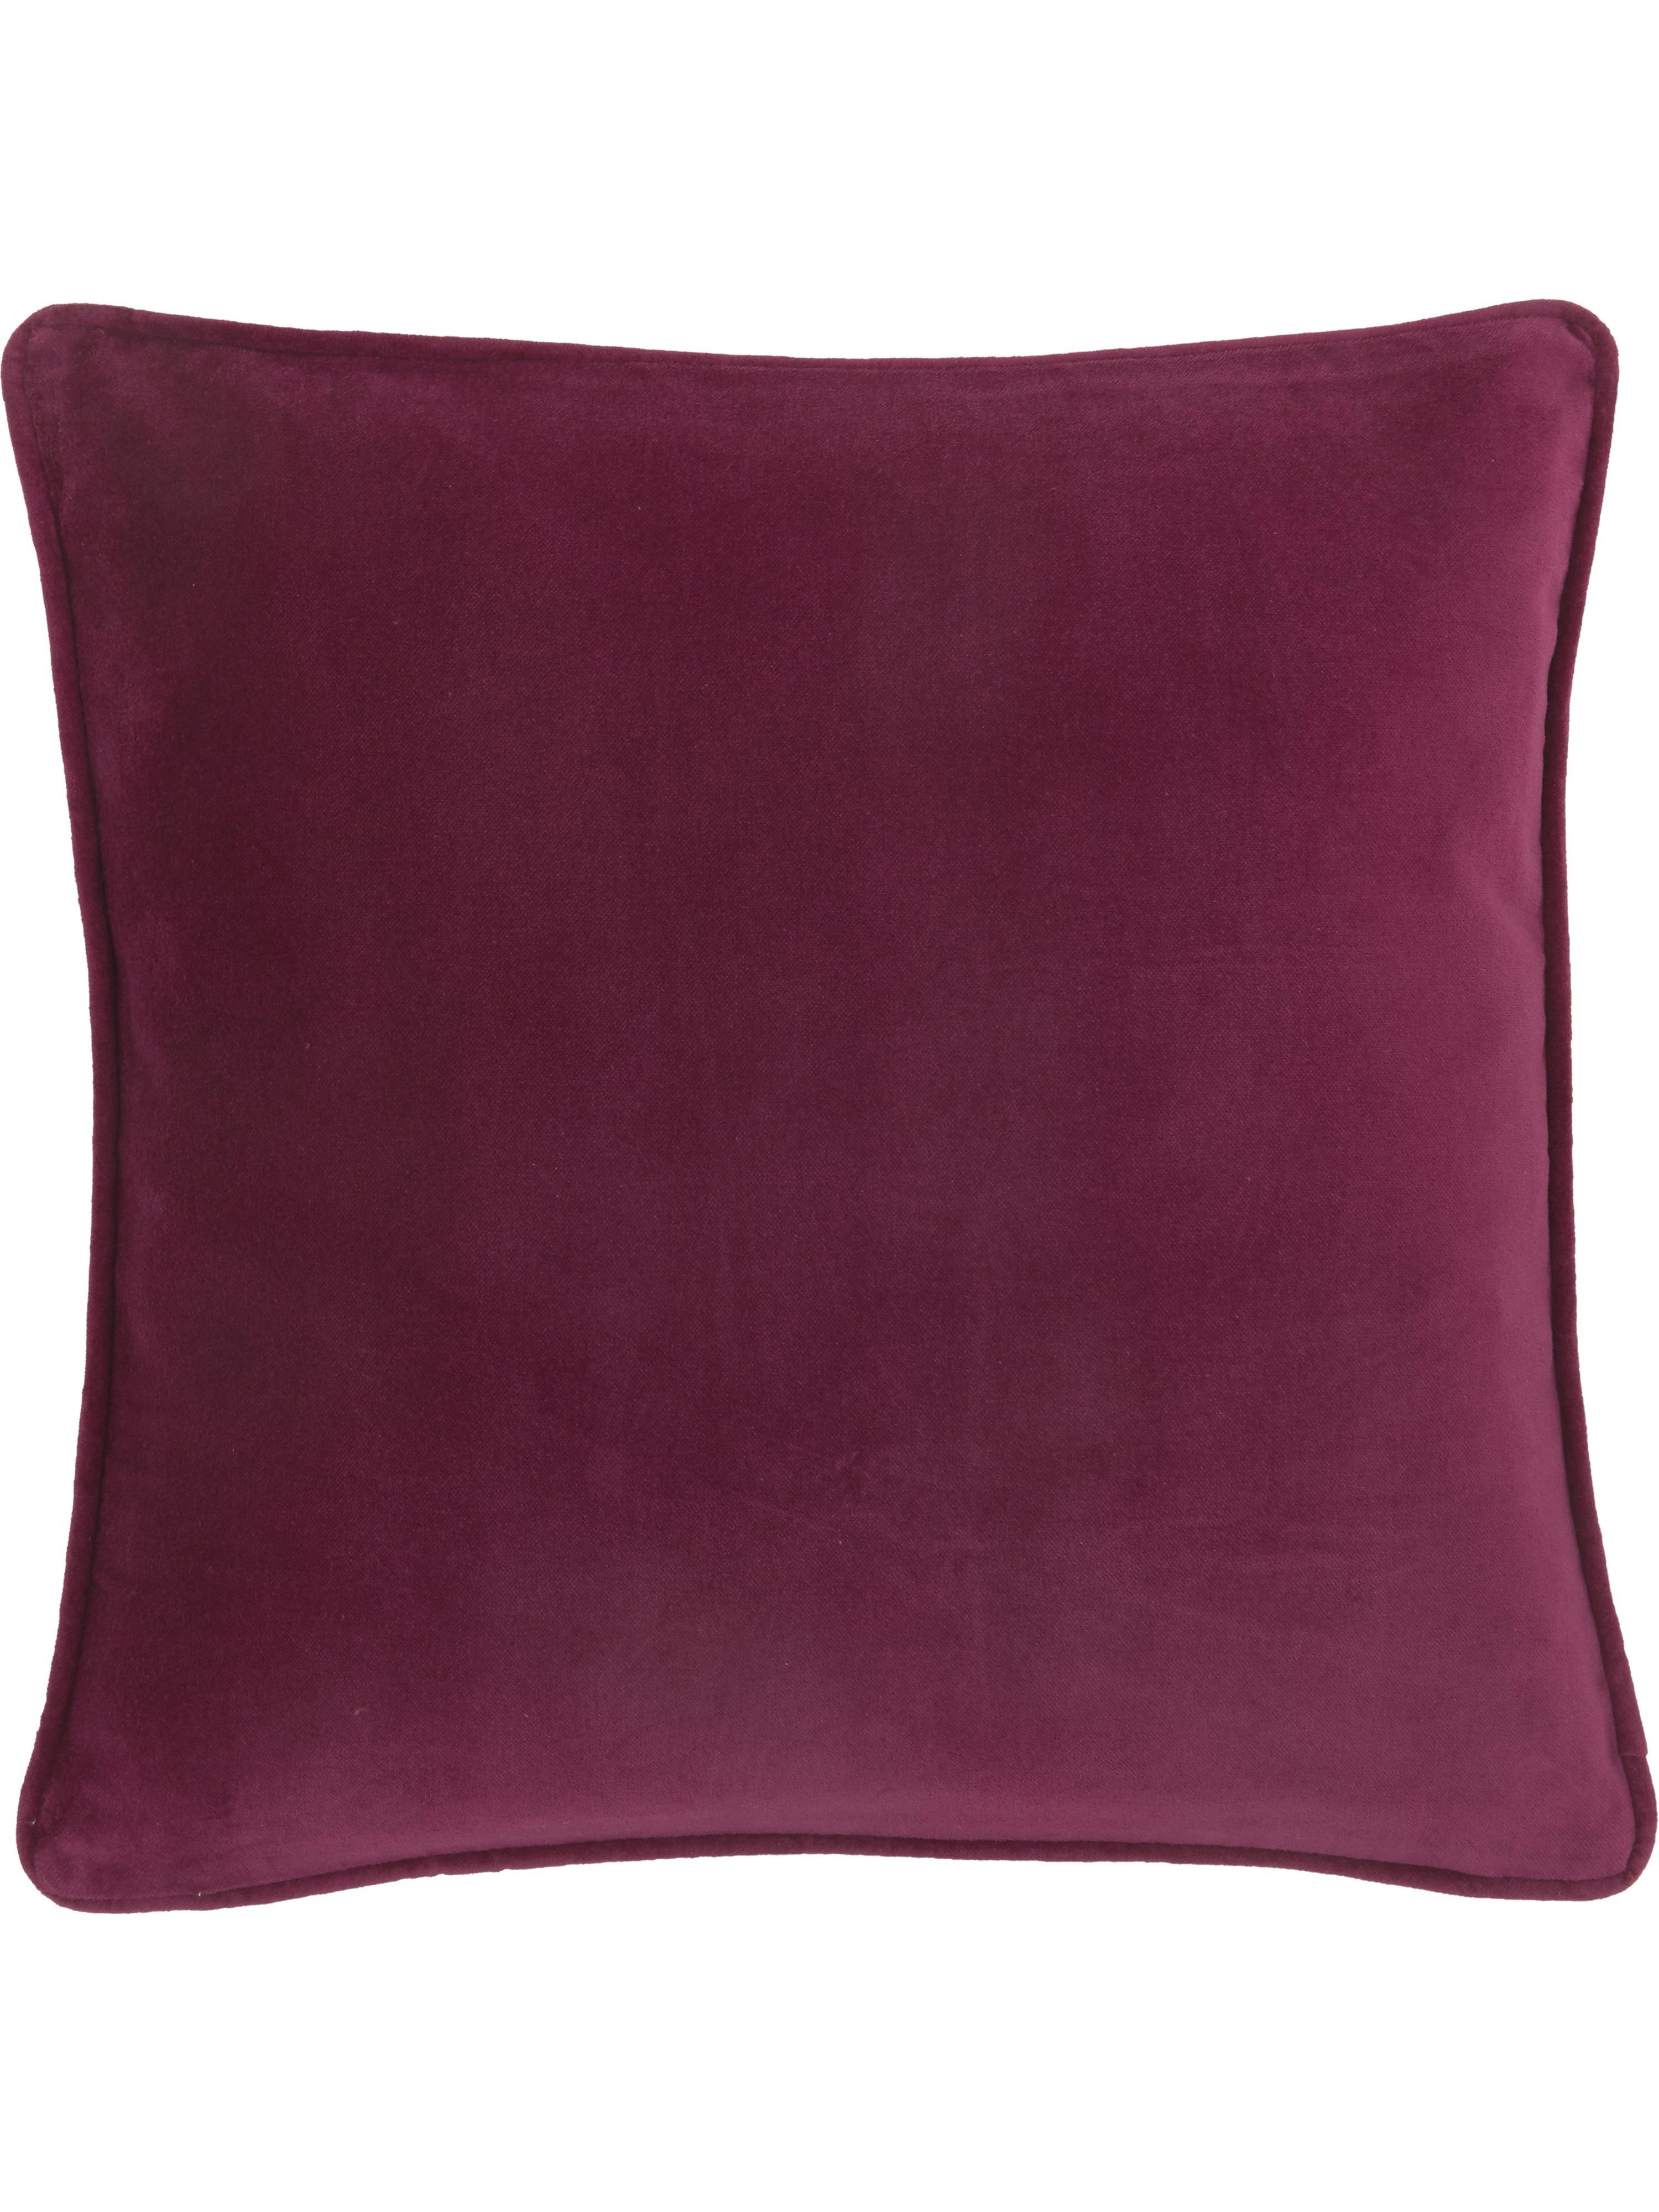 Jednobarevný sametový povlak na polštář Dana, Vínově červená